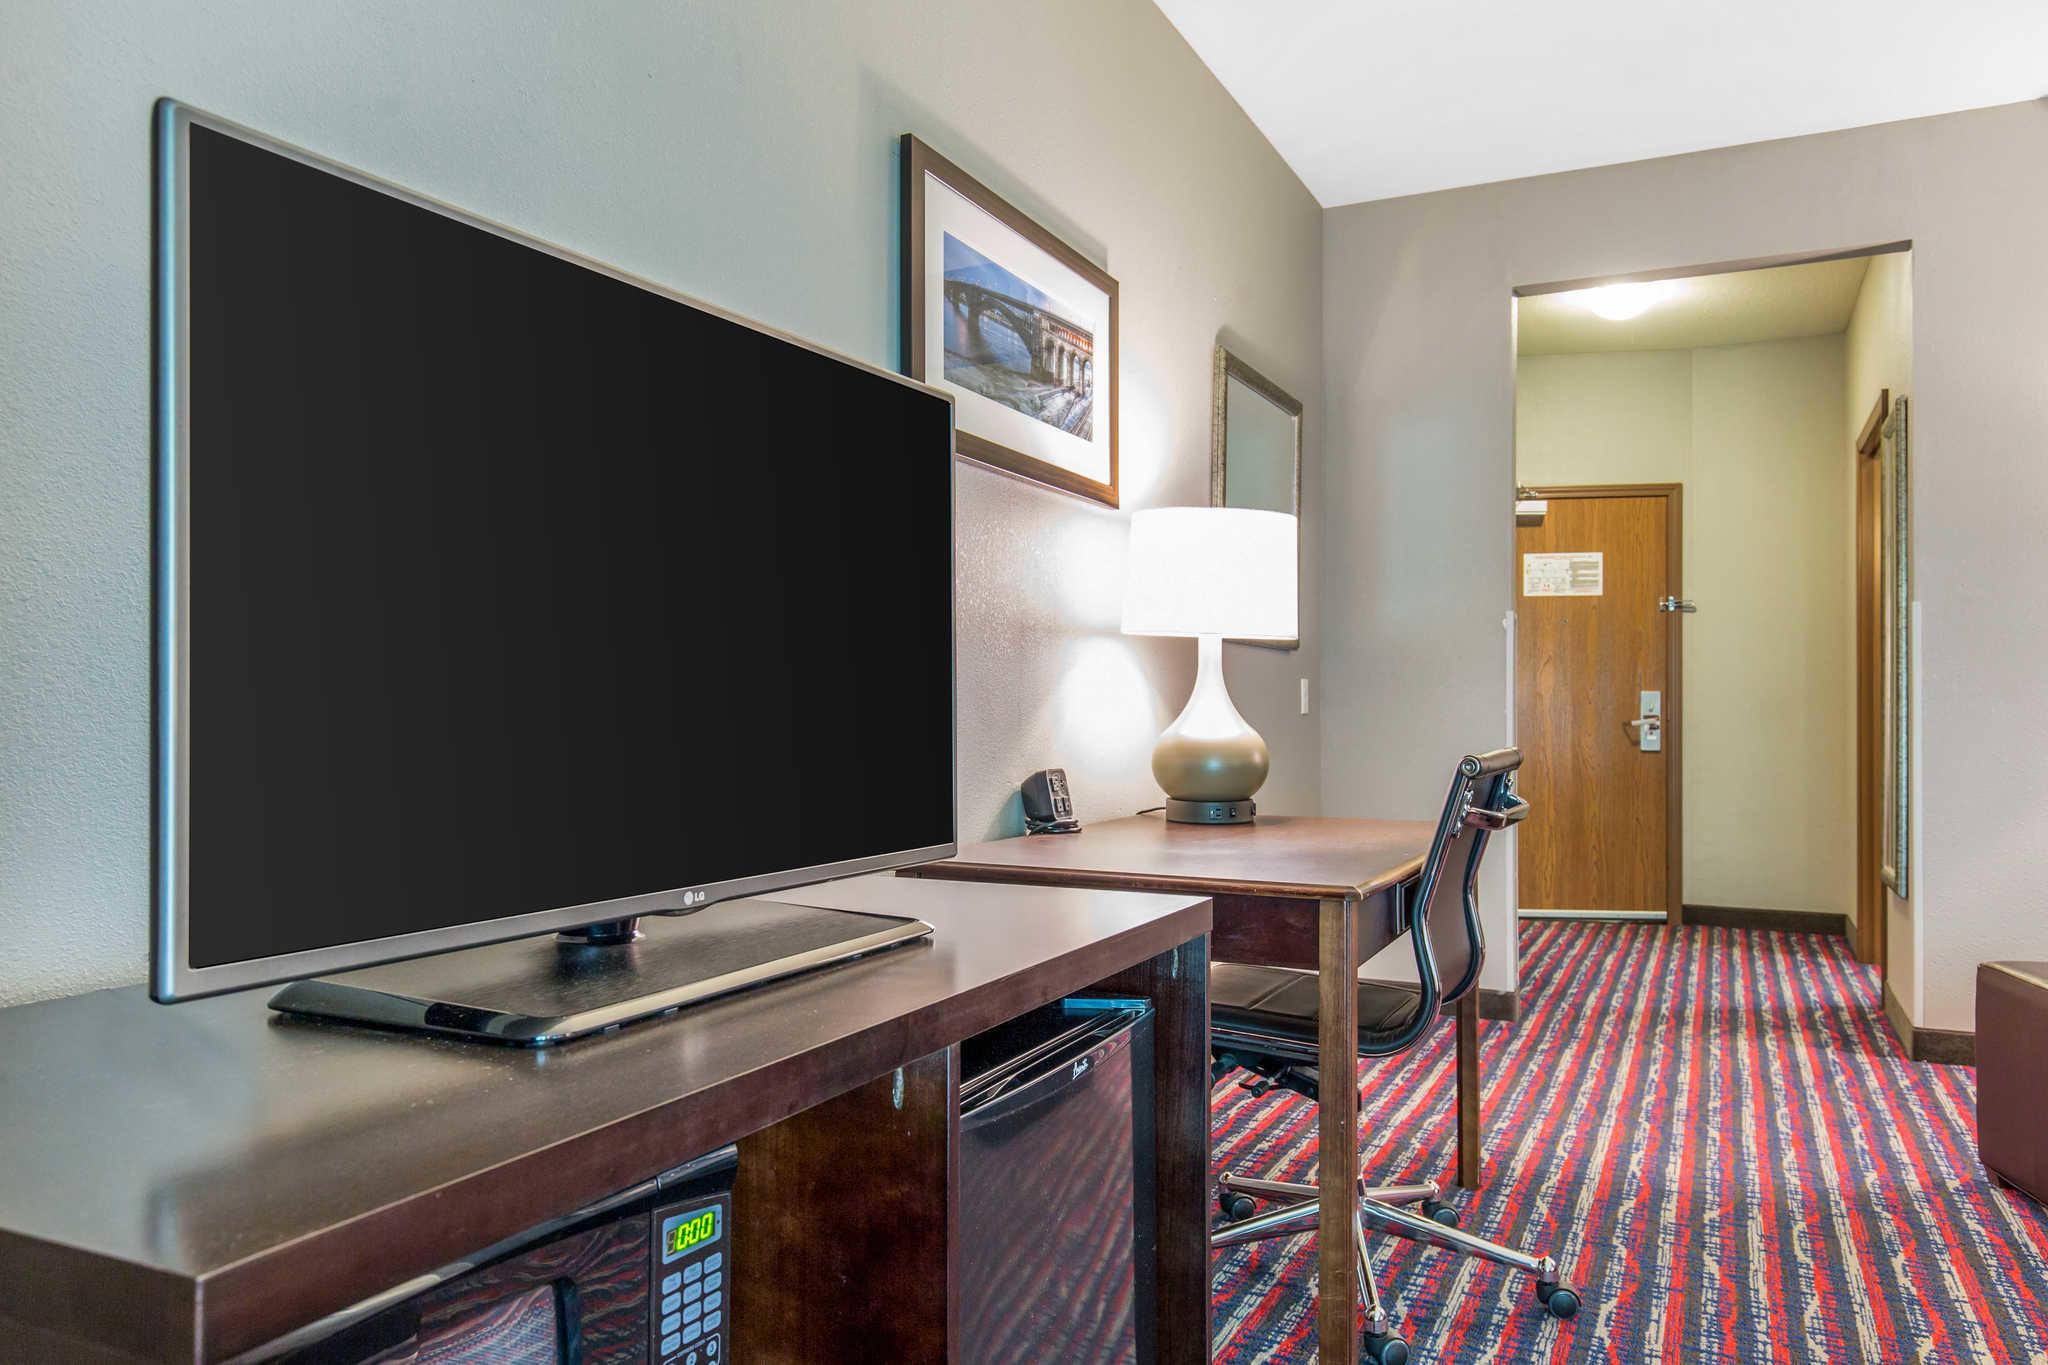 Comfort Suites image 10